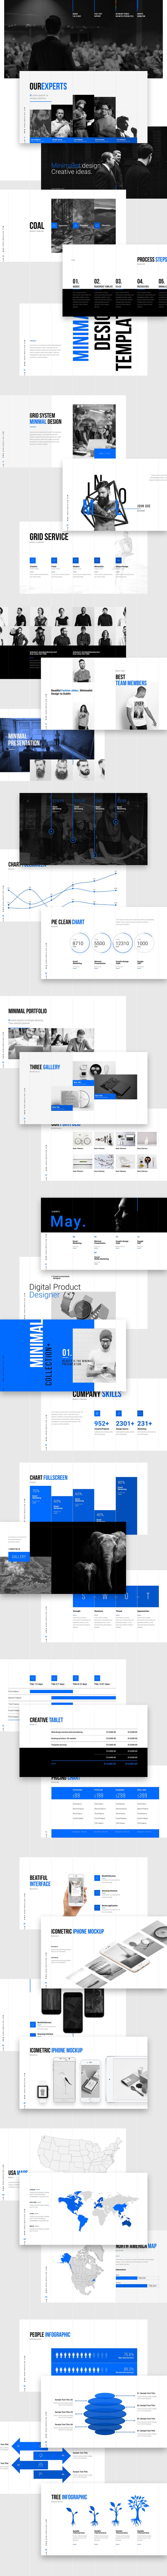 28 best presentation template images on pinterest | presentation, Presentation templates